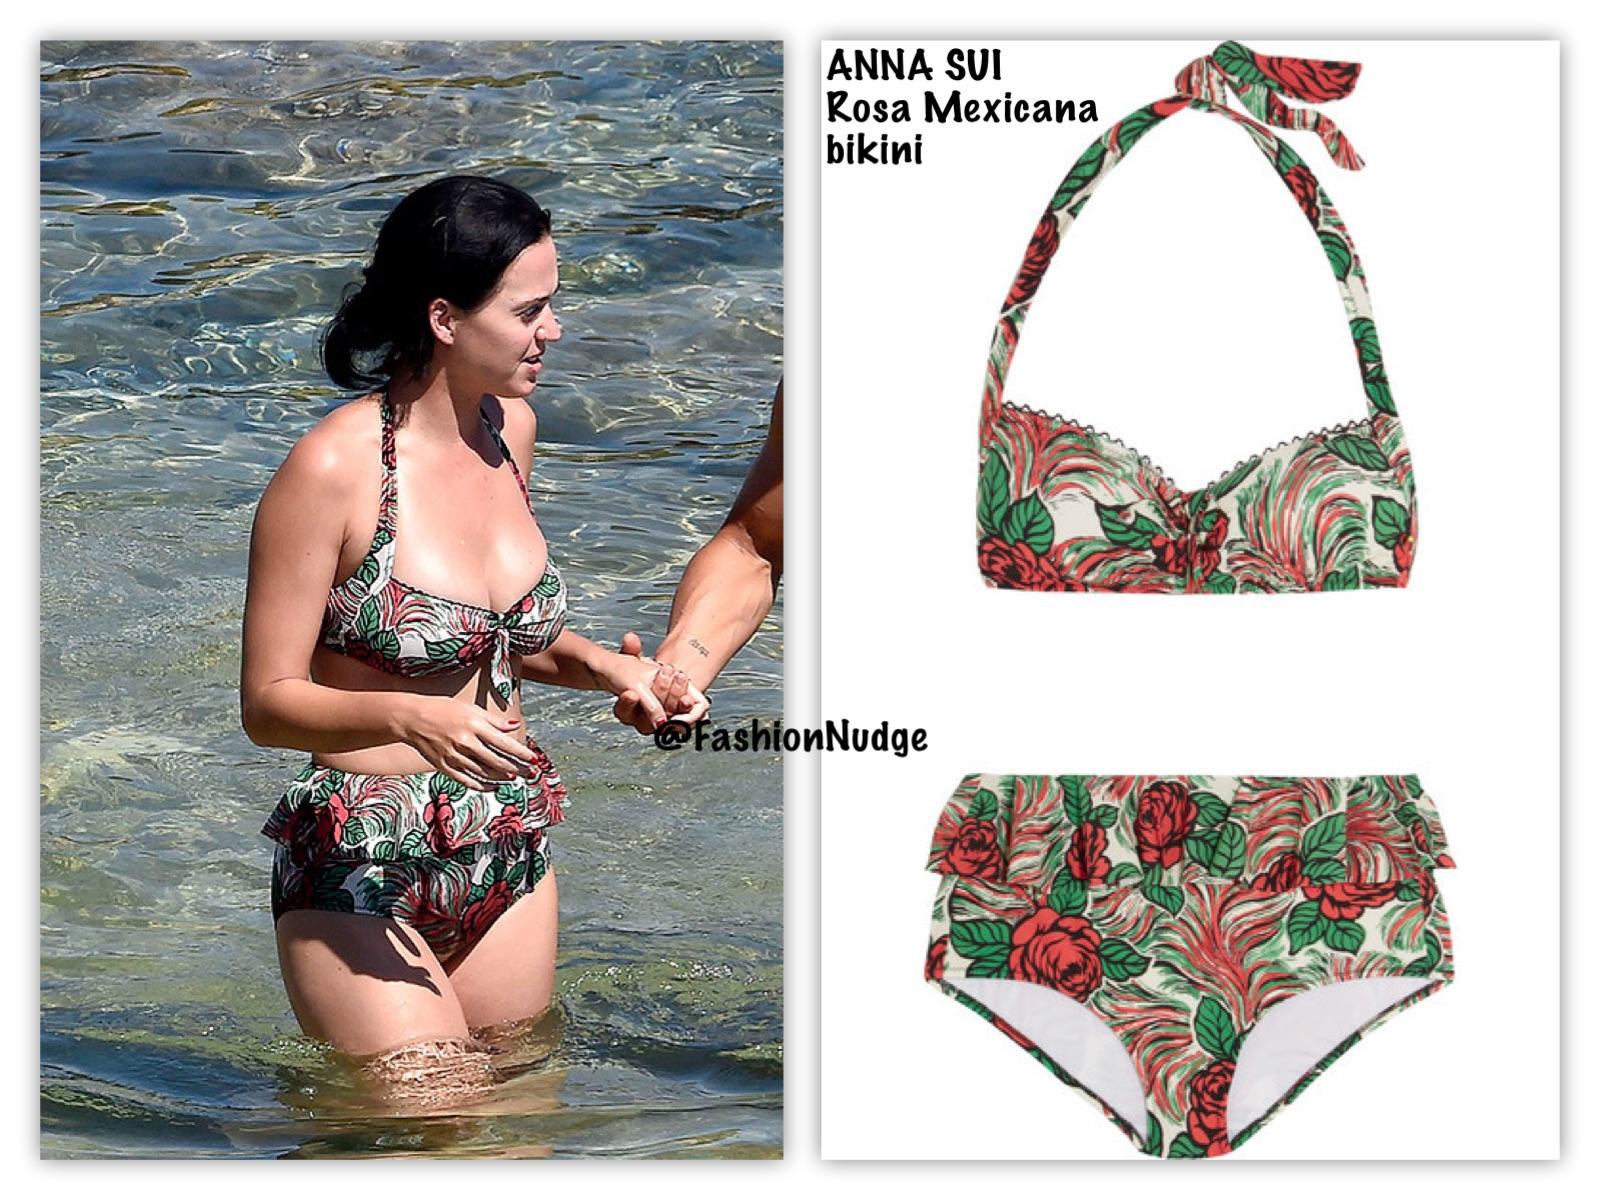 Bikini Katy Perry and Orlando Bloom nudes (49 foto and video), Pussy, Bikini, Feet, panties 2020